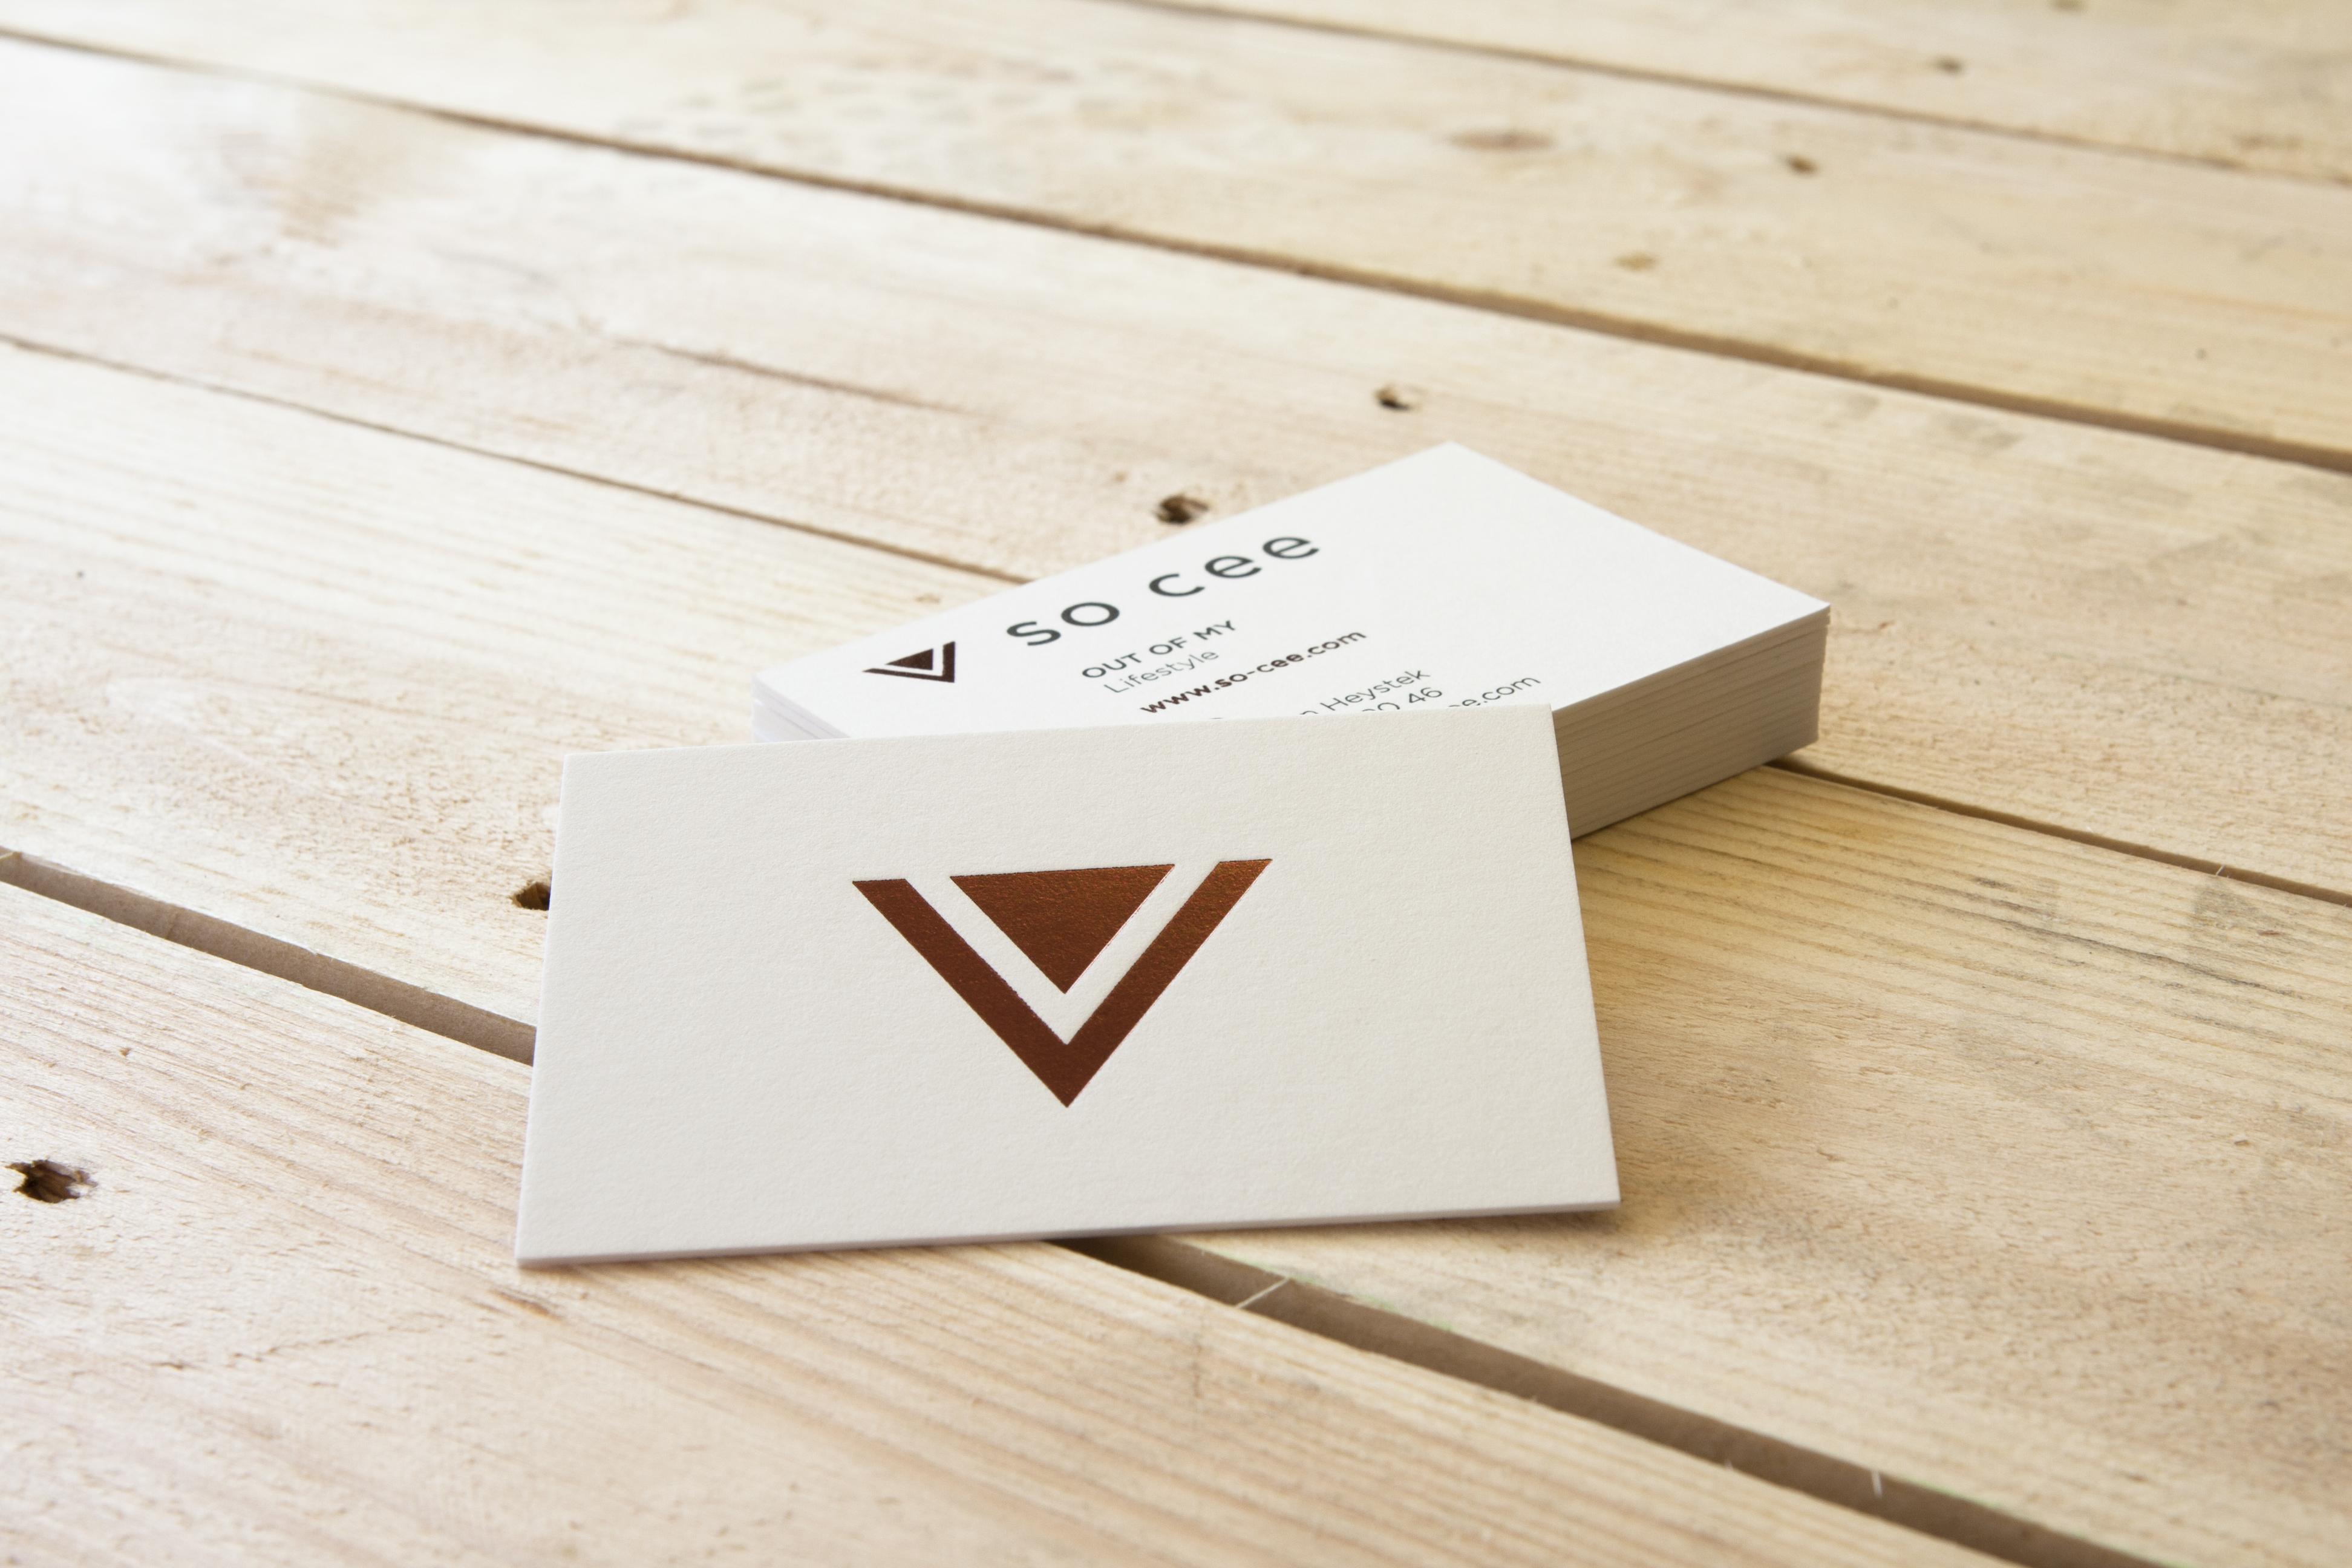 Papyrus Gallery - ReproPrintXL - Business Cards So Cee